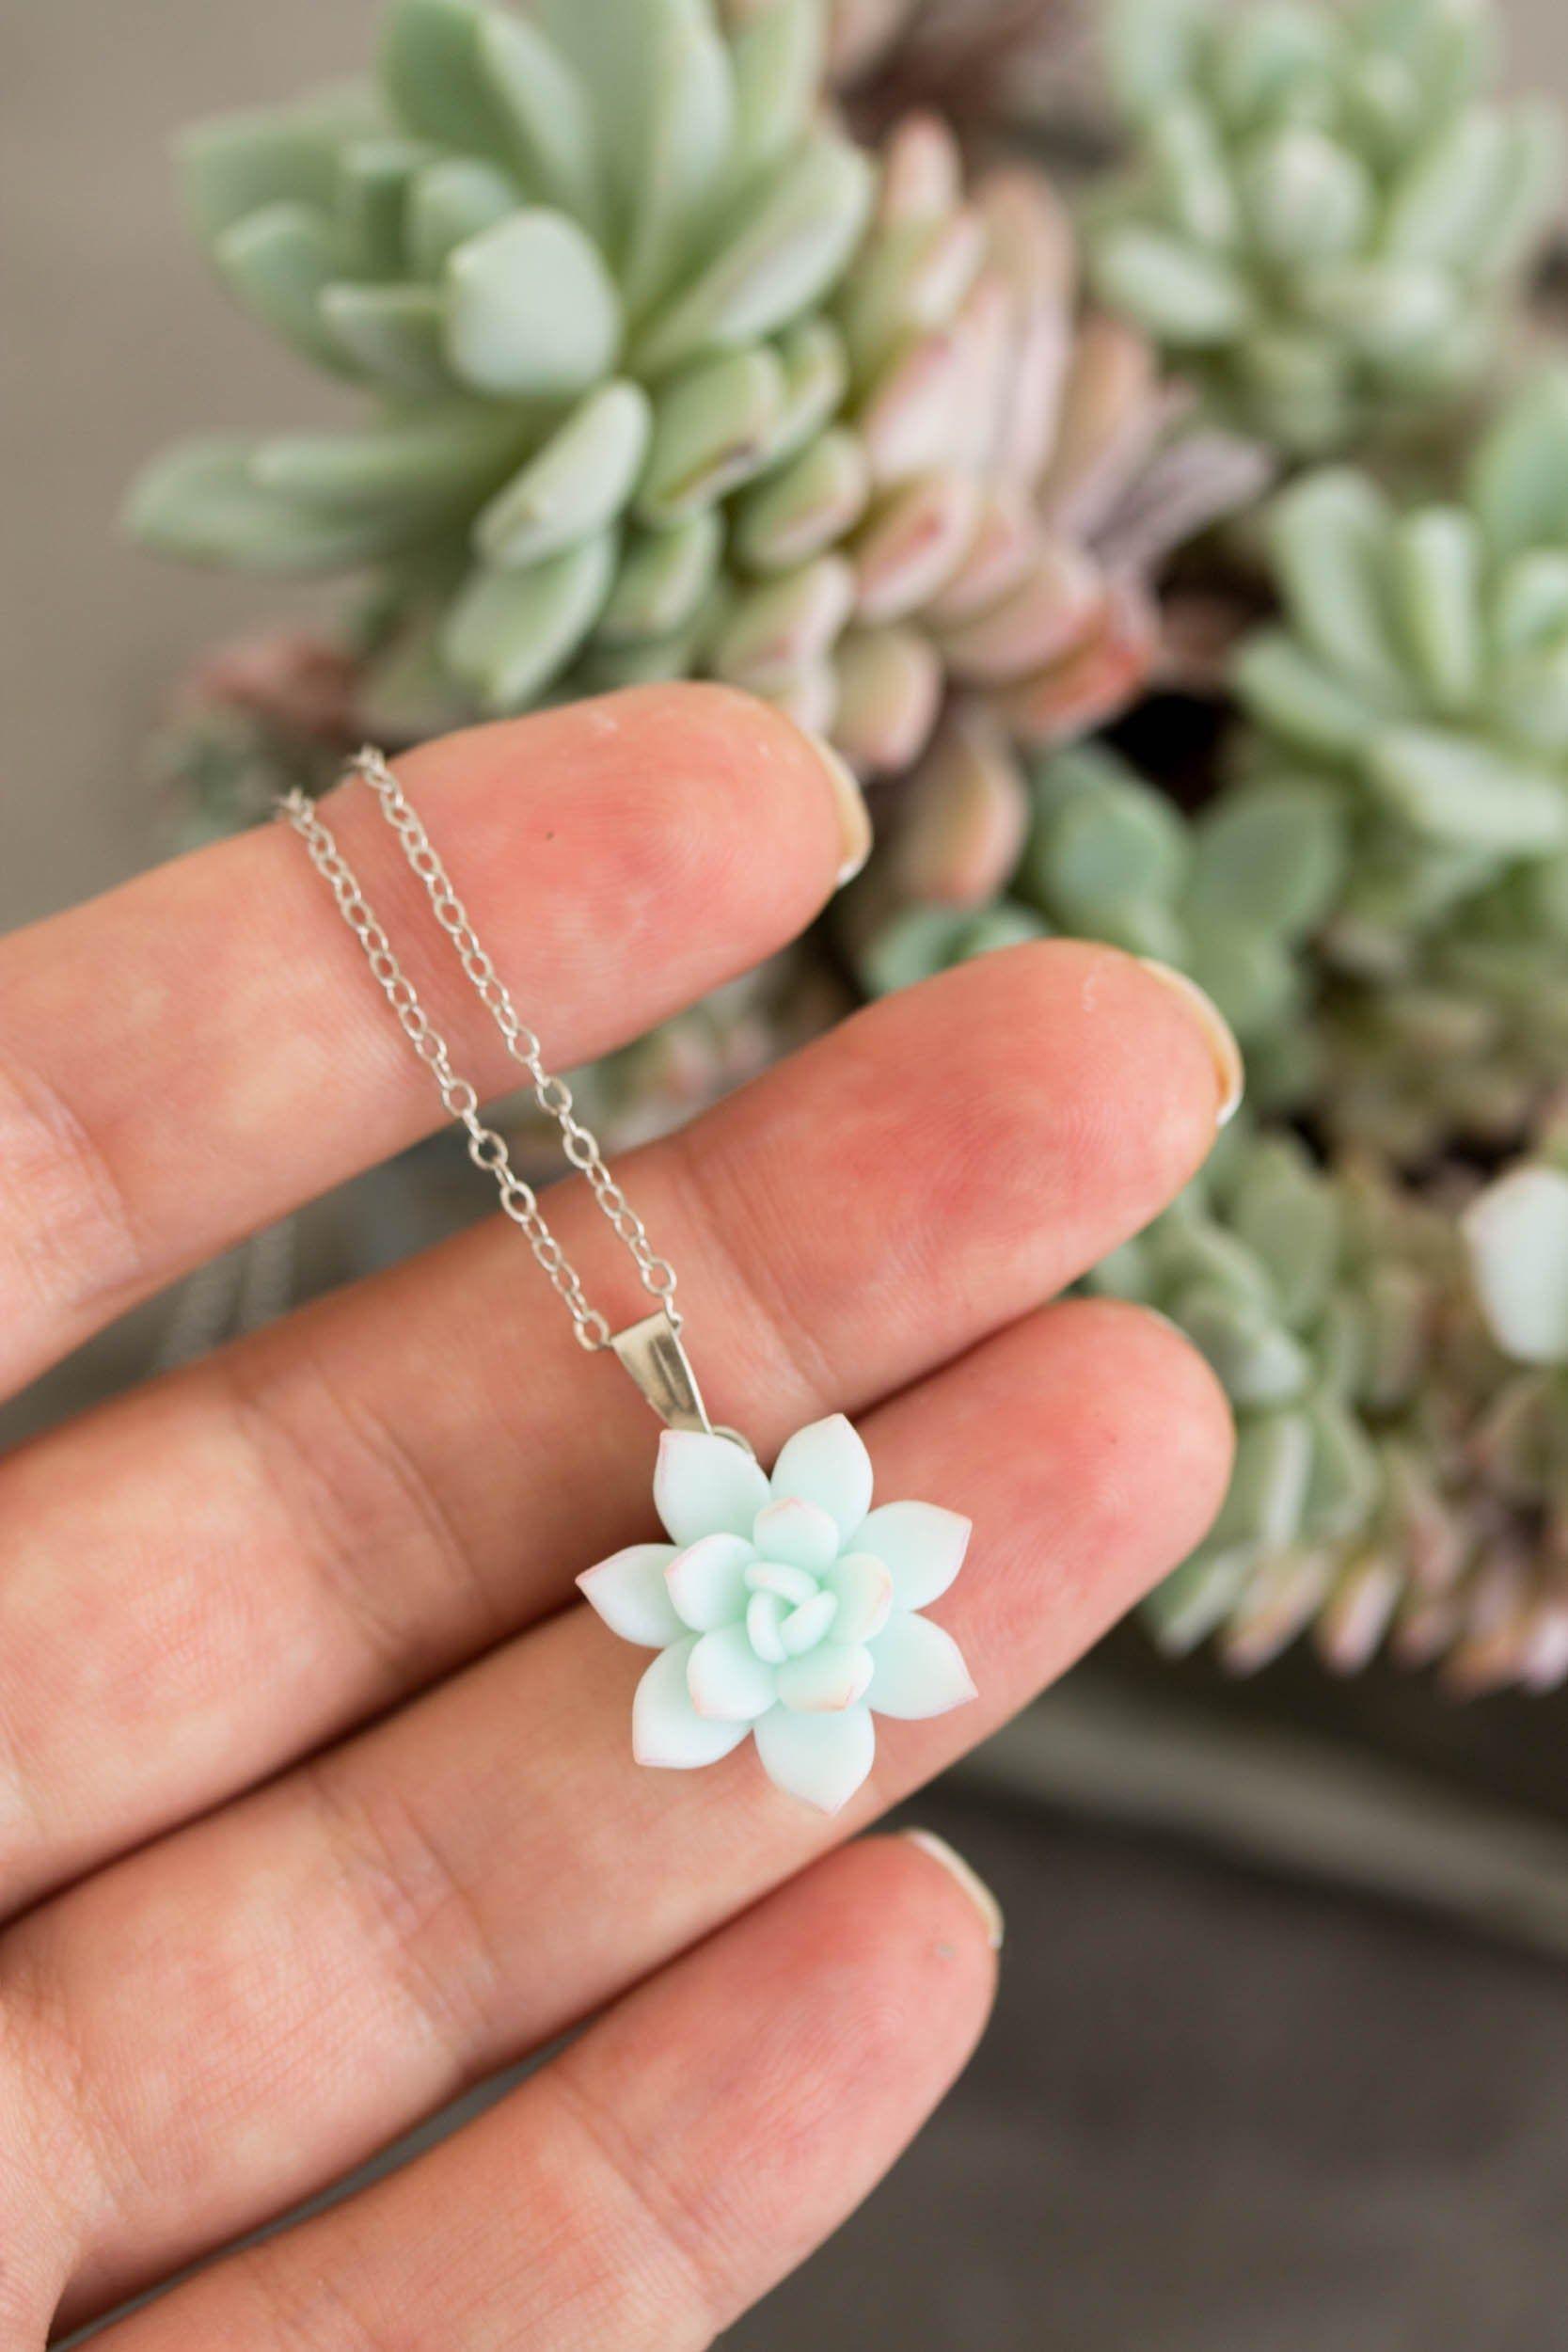 Succulent Pendant Necklace - Clay Cactus Plant Drop Charm Necklace Turquoise Succulent Jewelry Gift